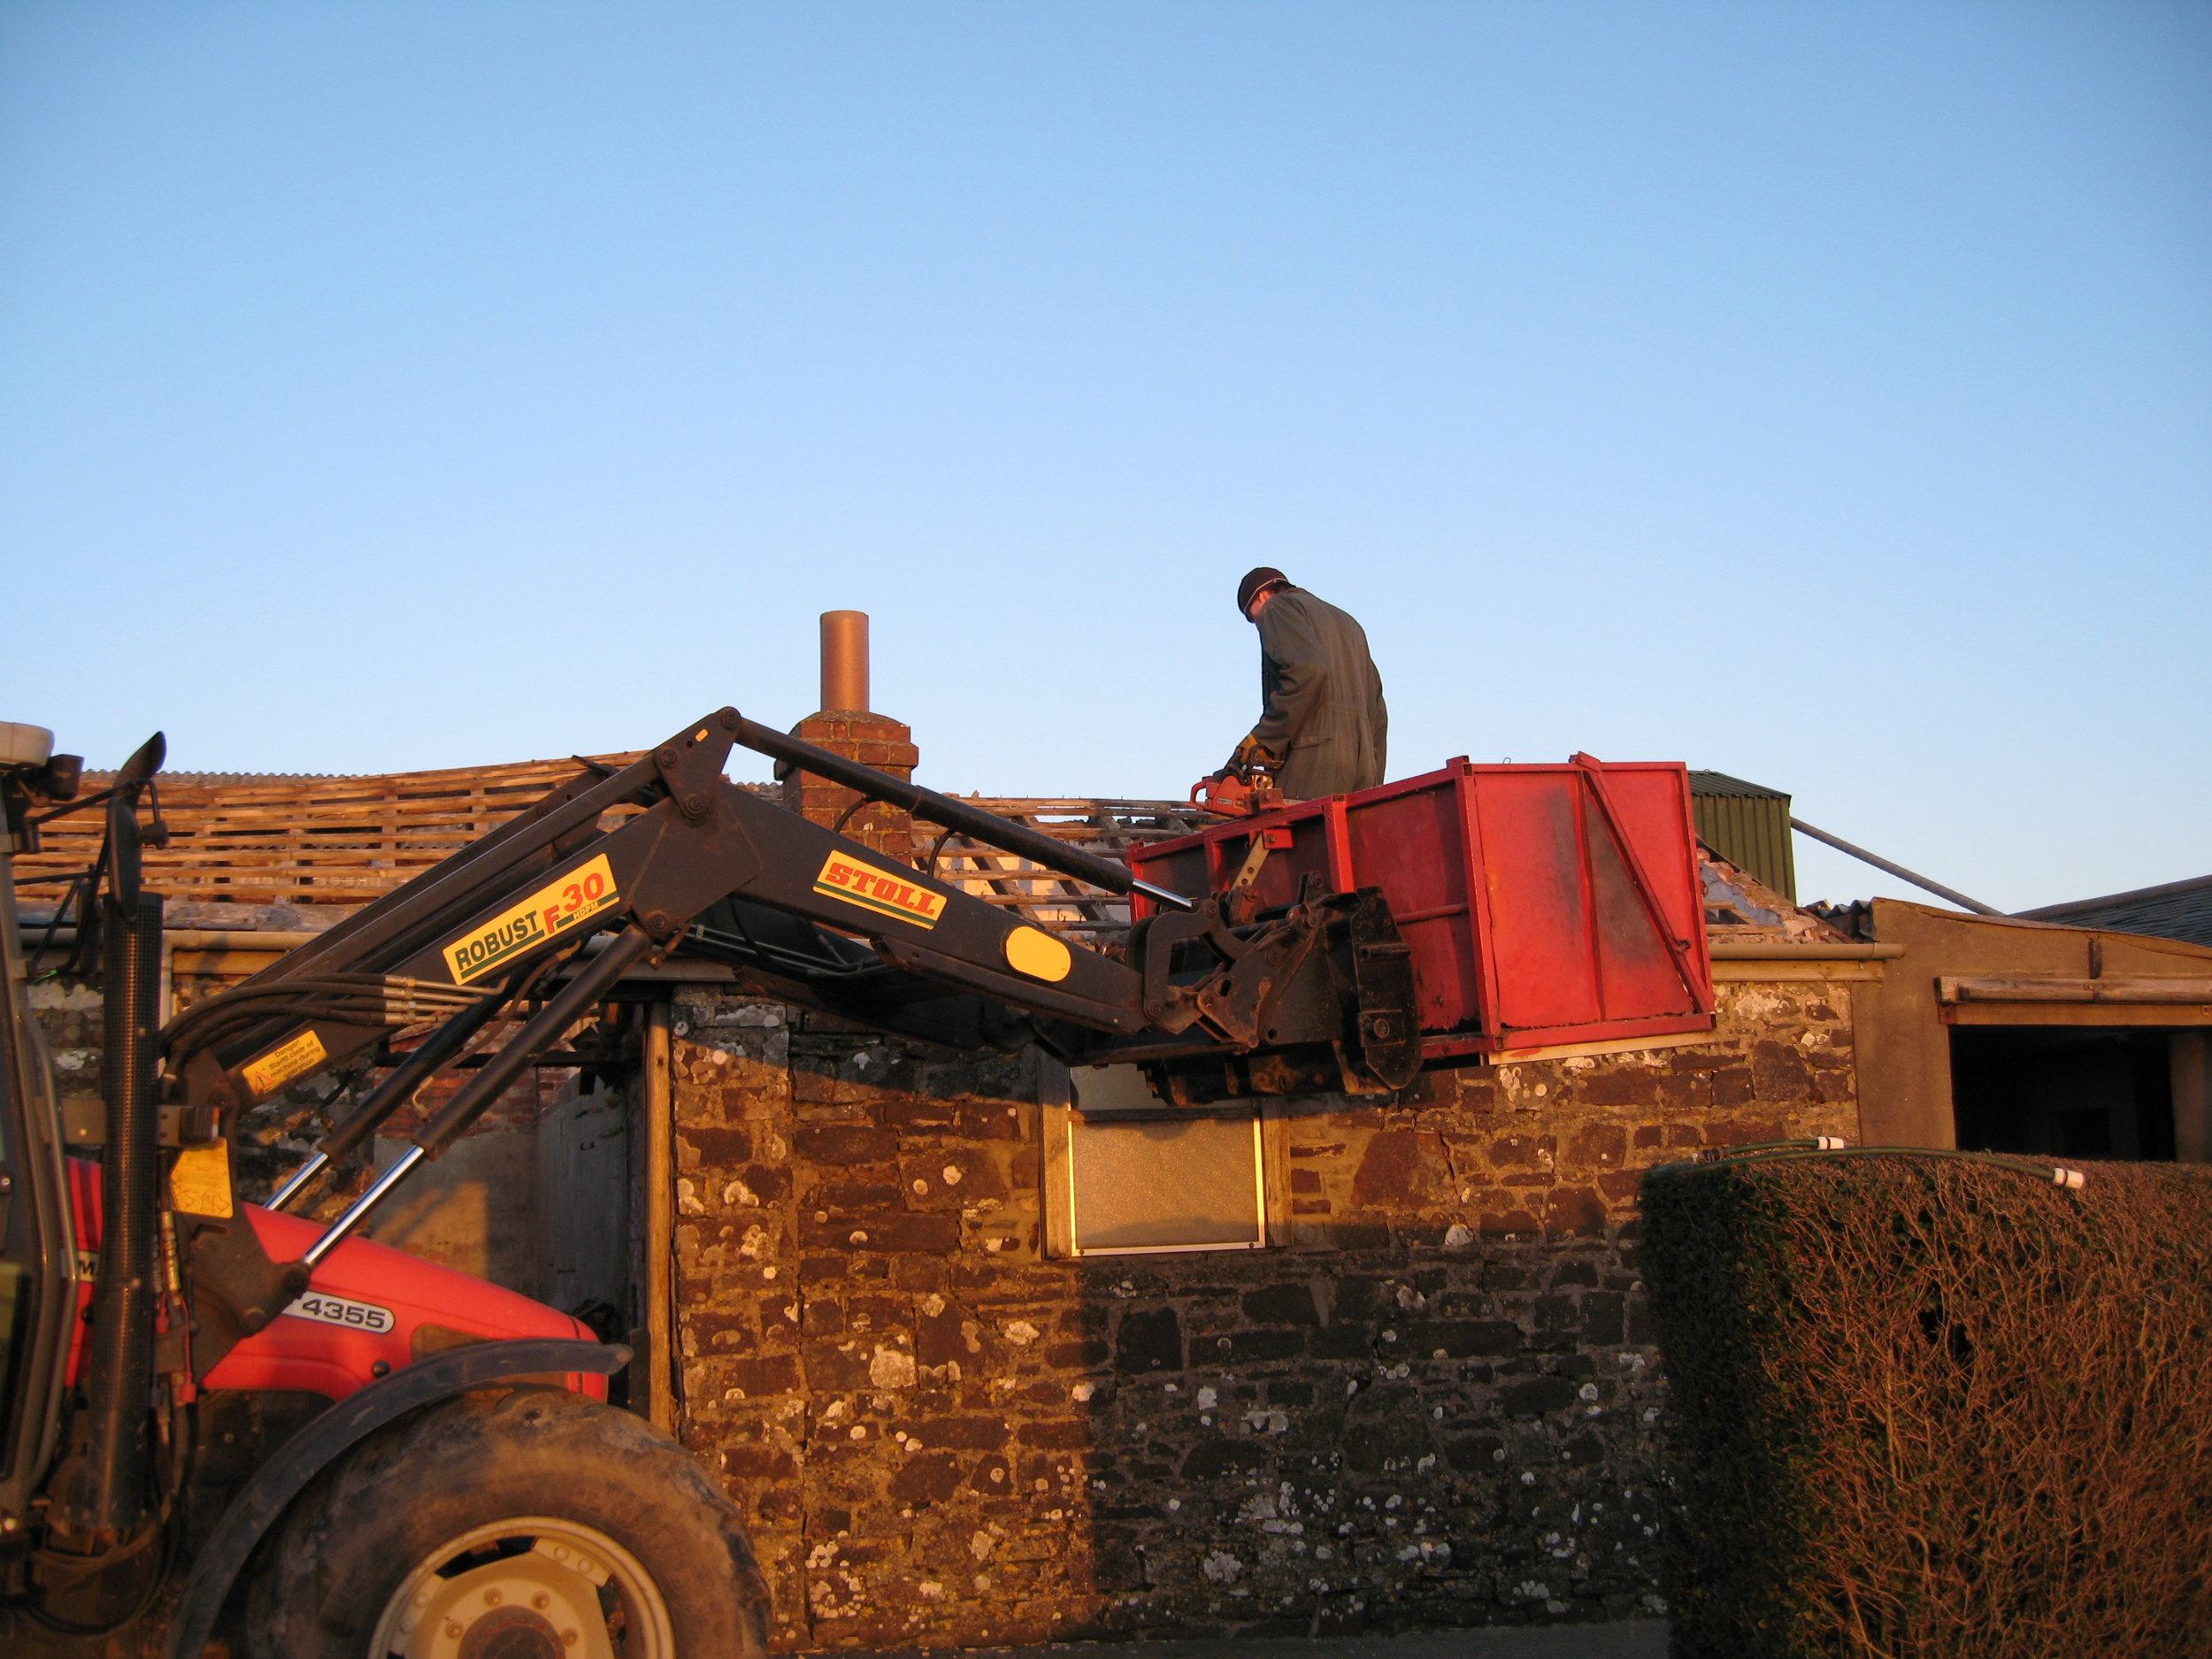 Ryan Blewett taking off the roof (now Dewdrop Dairy's bedroom window)